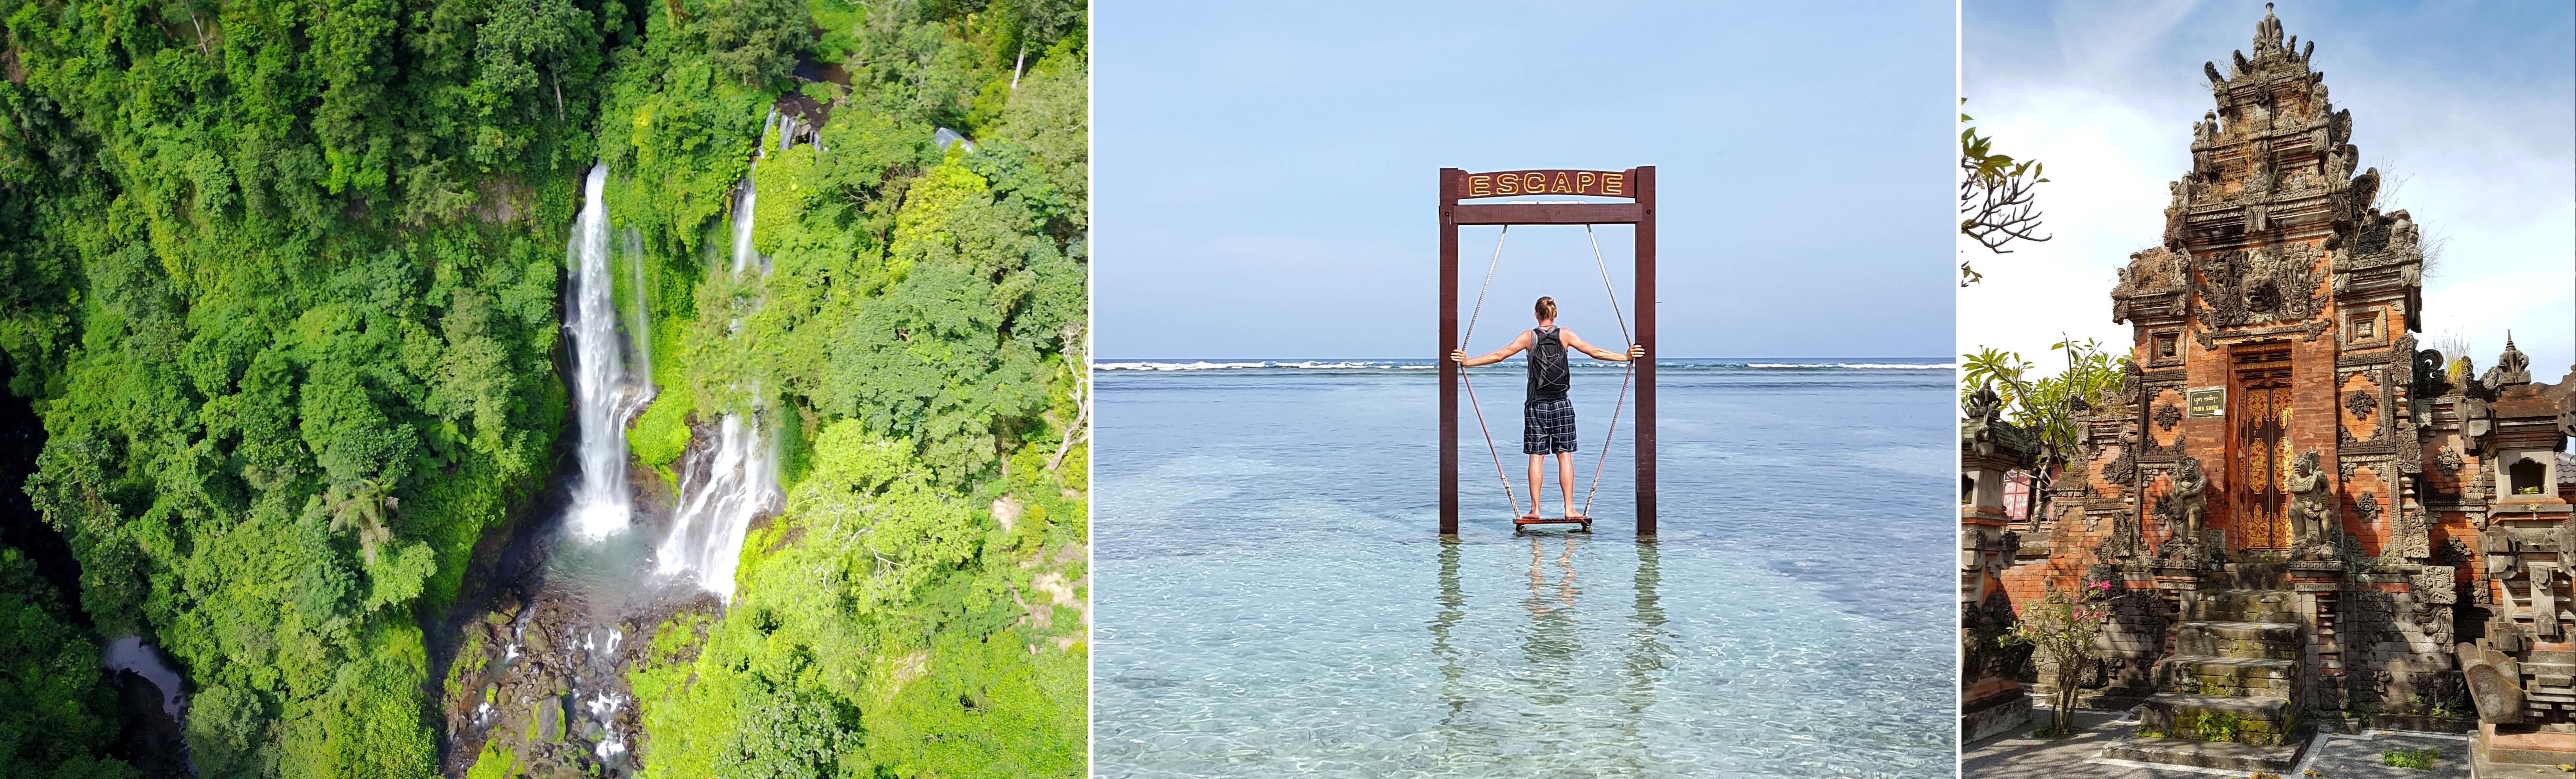 Bali: unser Reiseplan